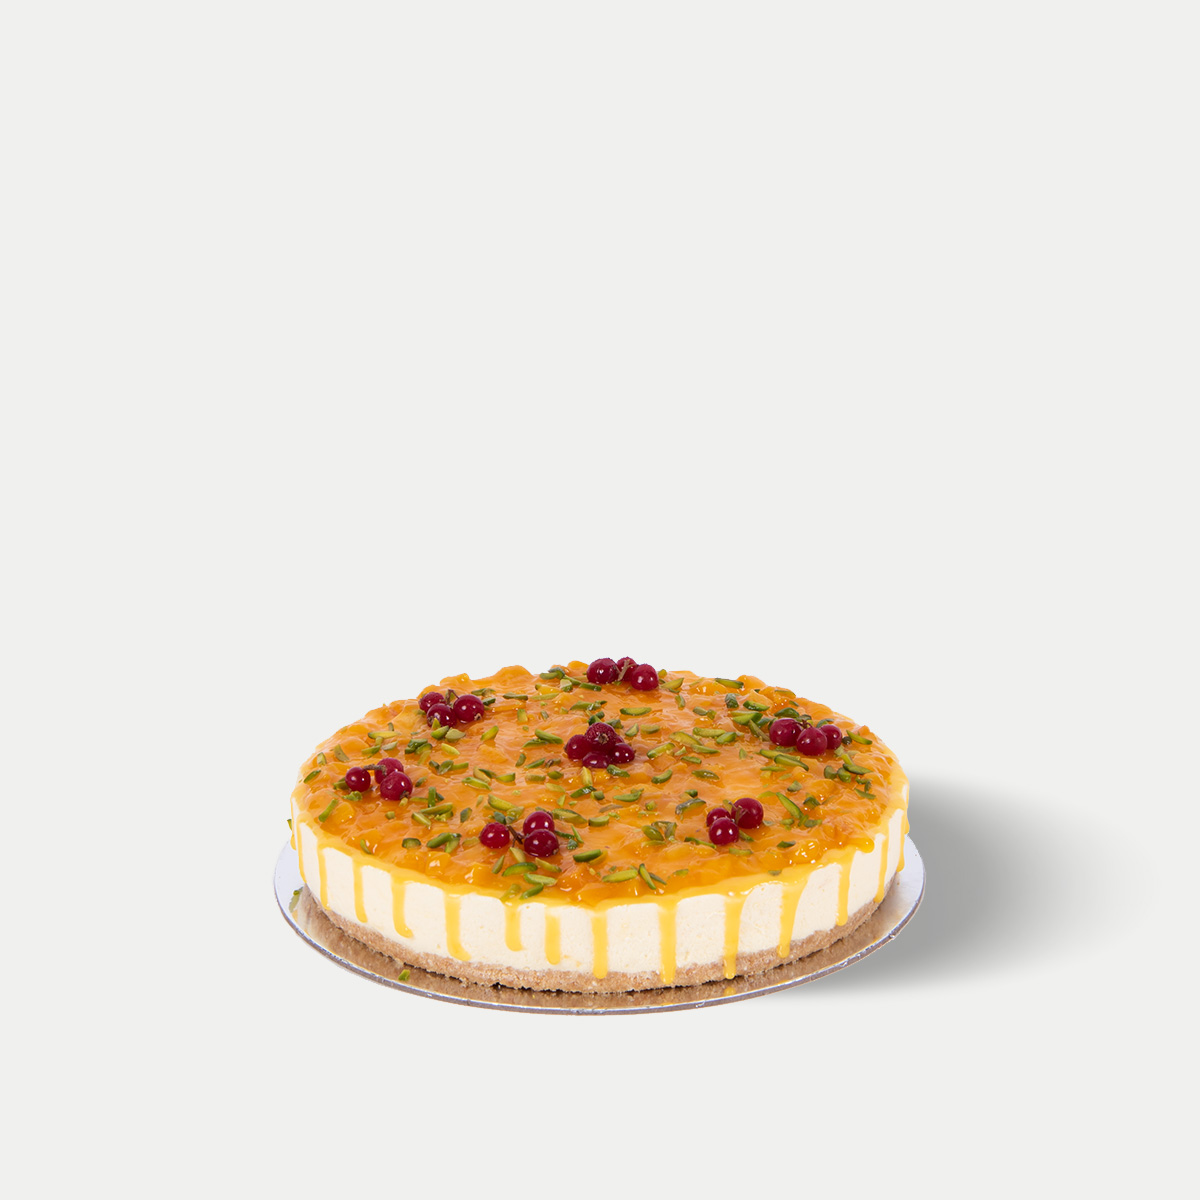 Mango Cheesecake 8 INCH